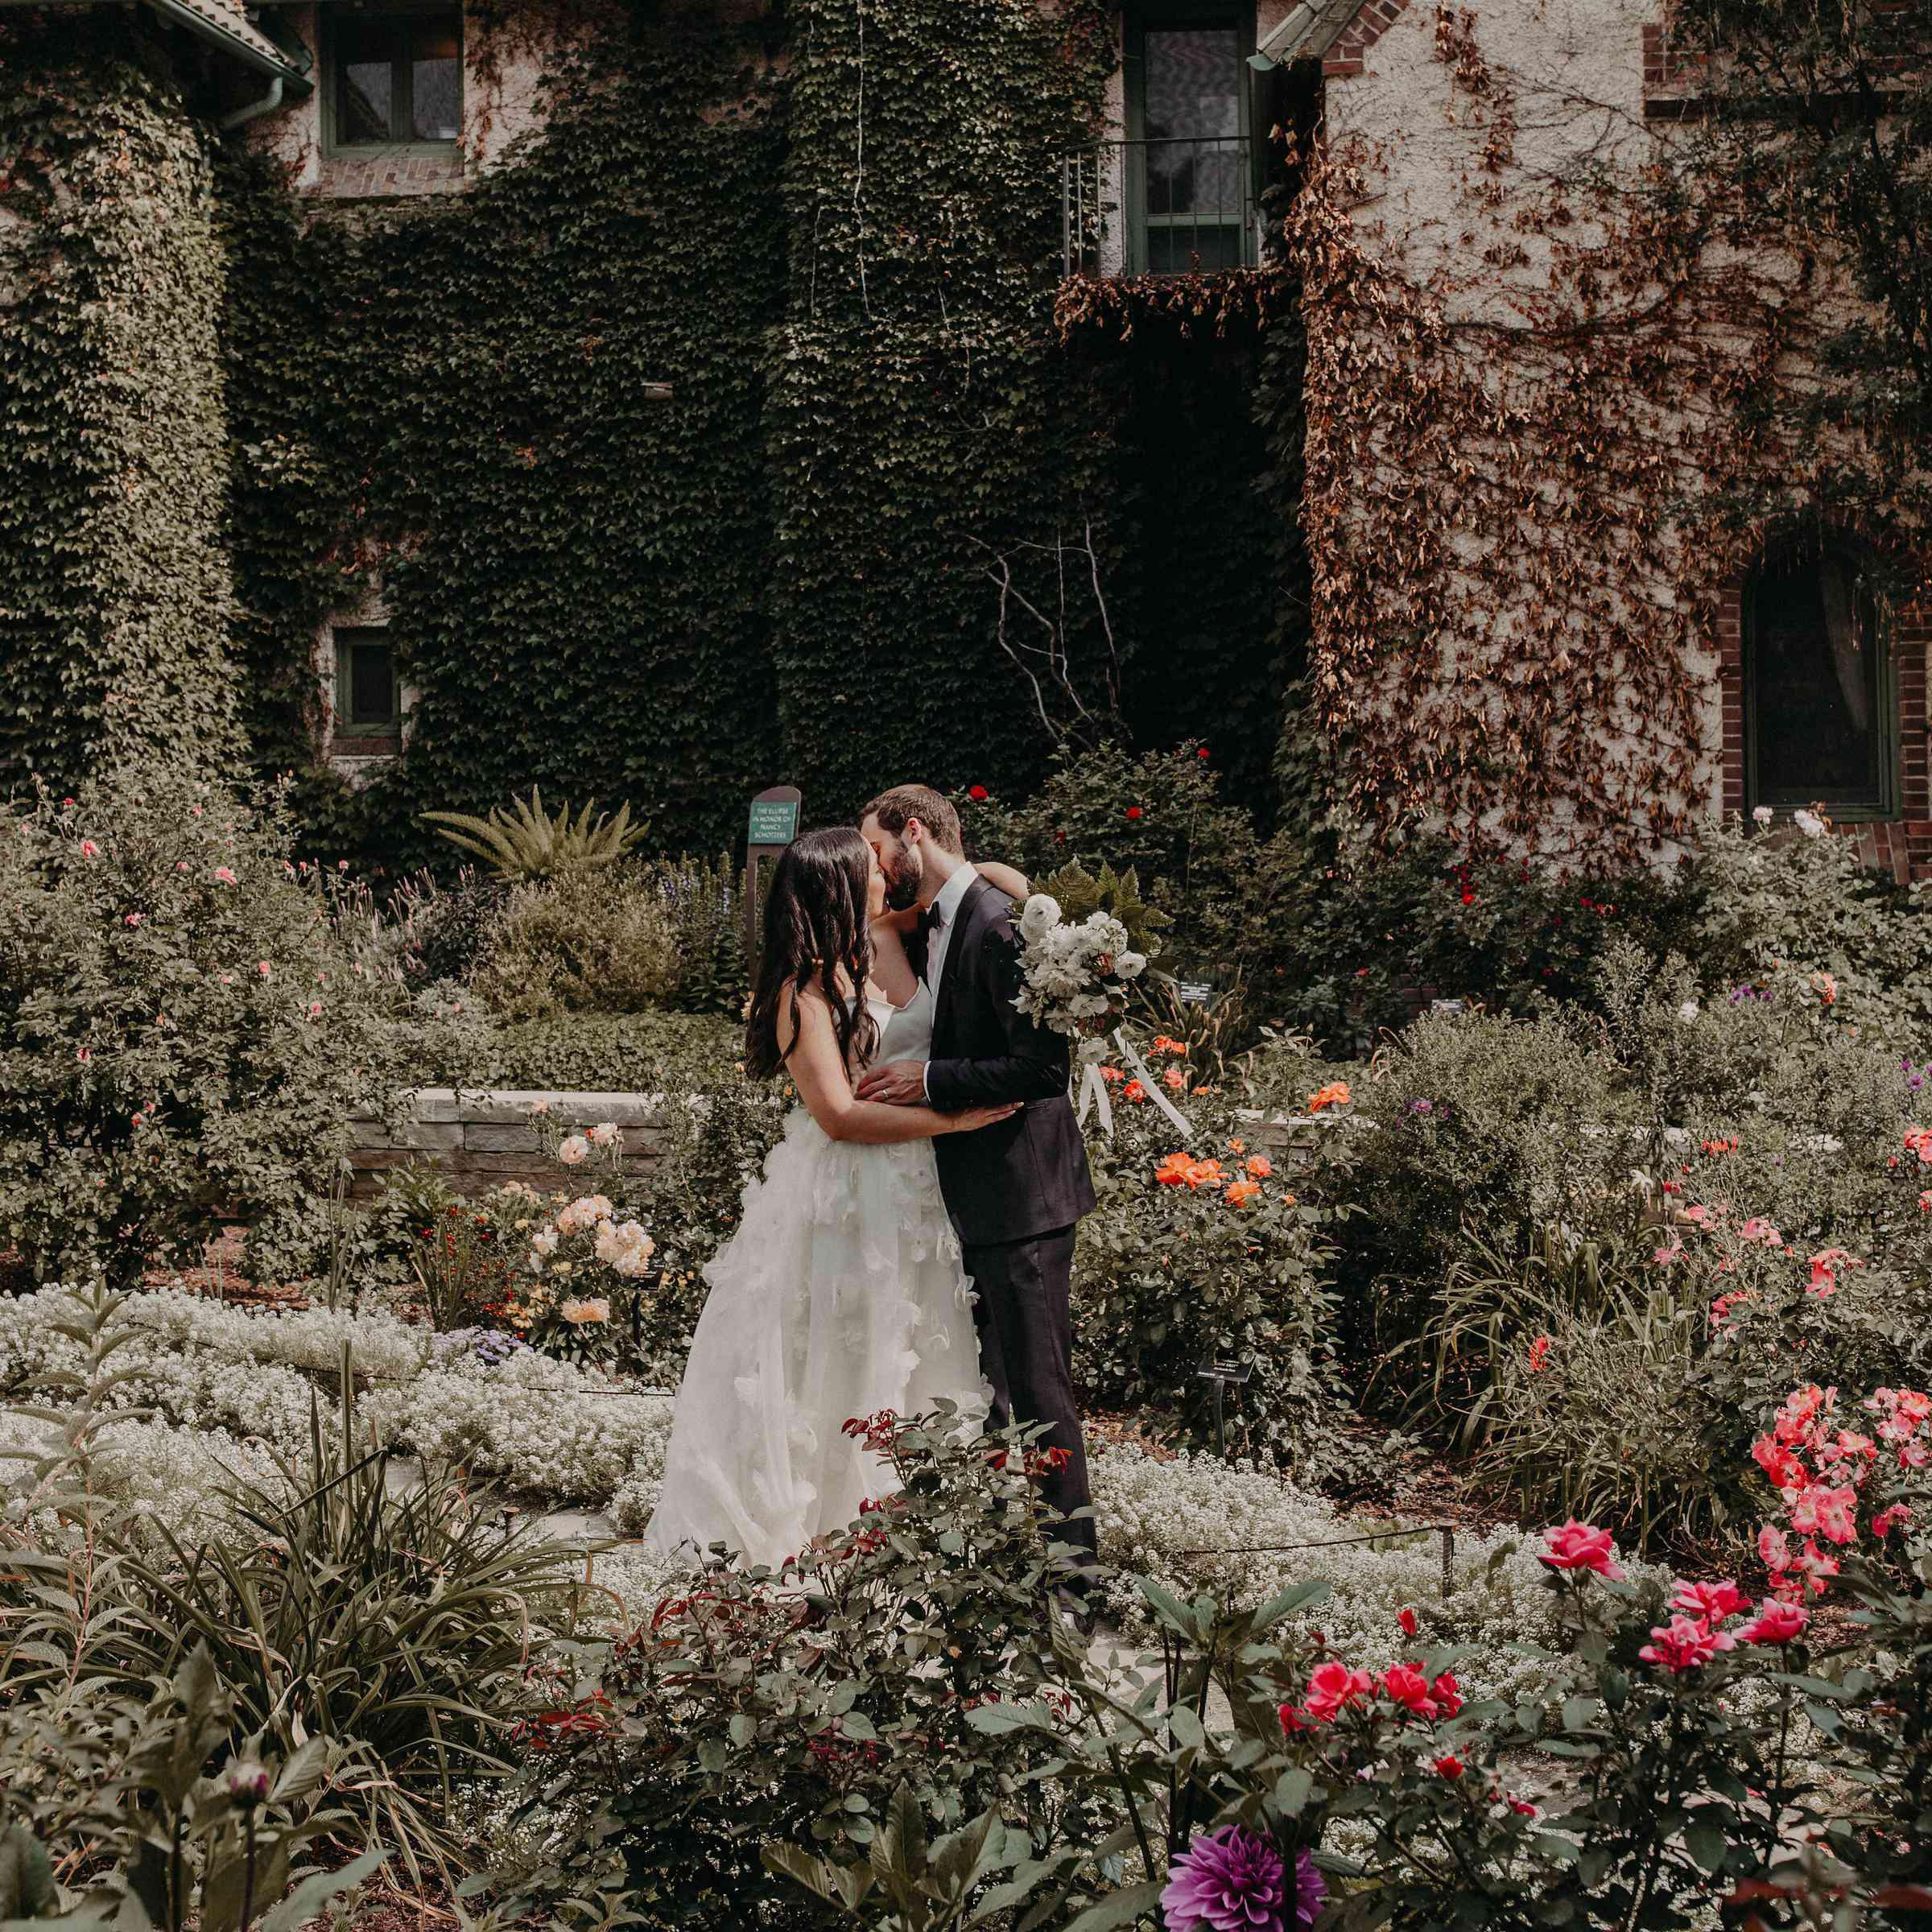 22 Romantic Wedding Ideas You'll Fall For